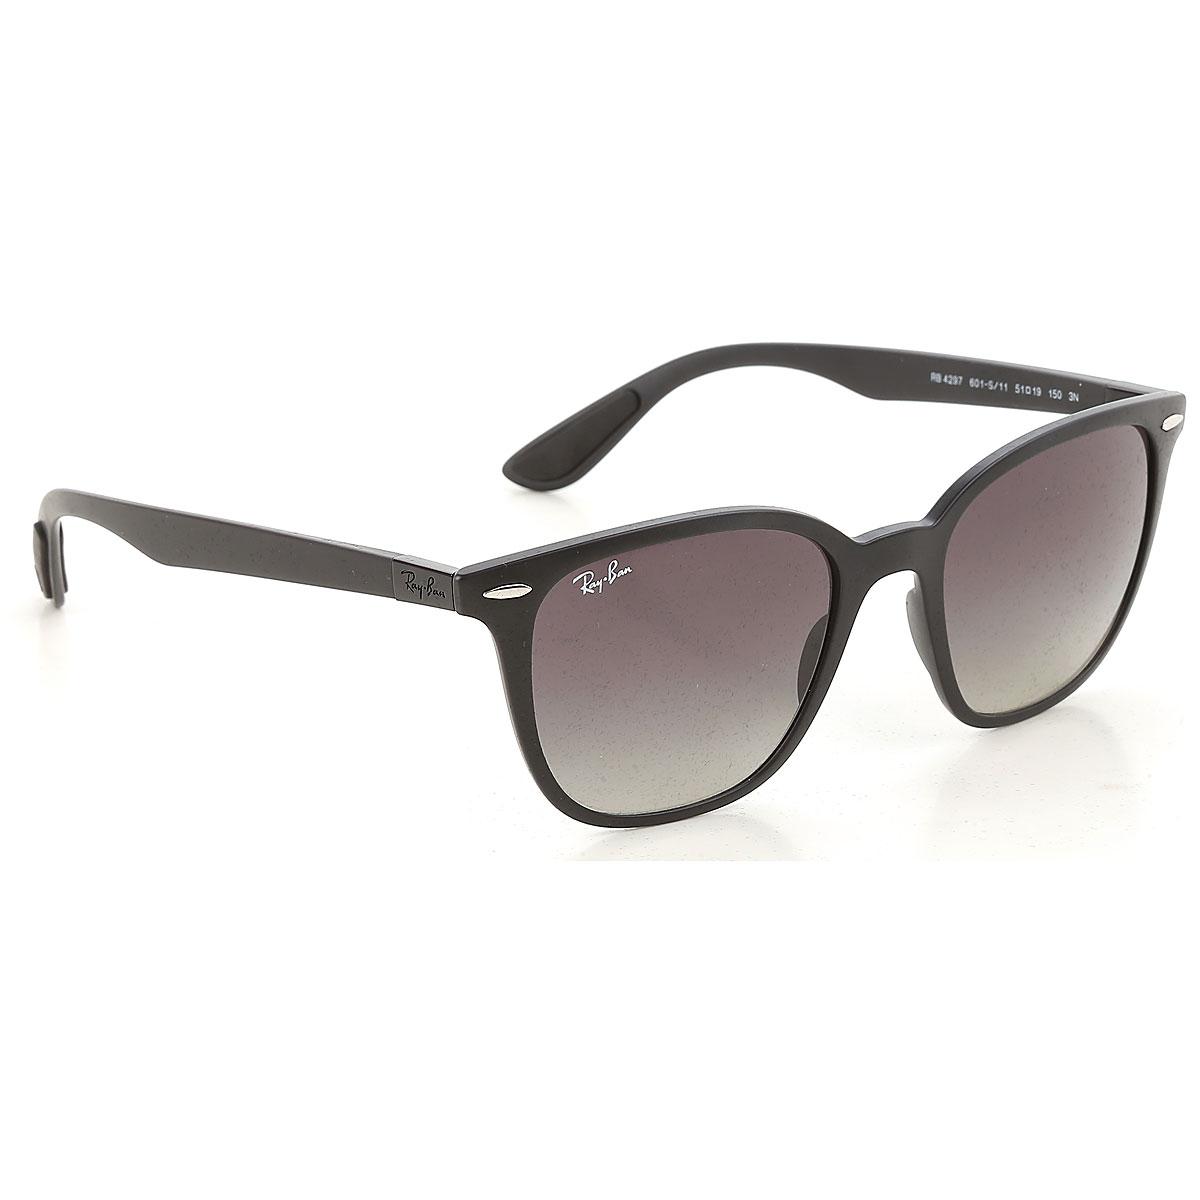 Ray Ban Sunglasses On Sale, Matte Black, 2019